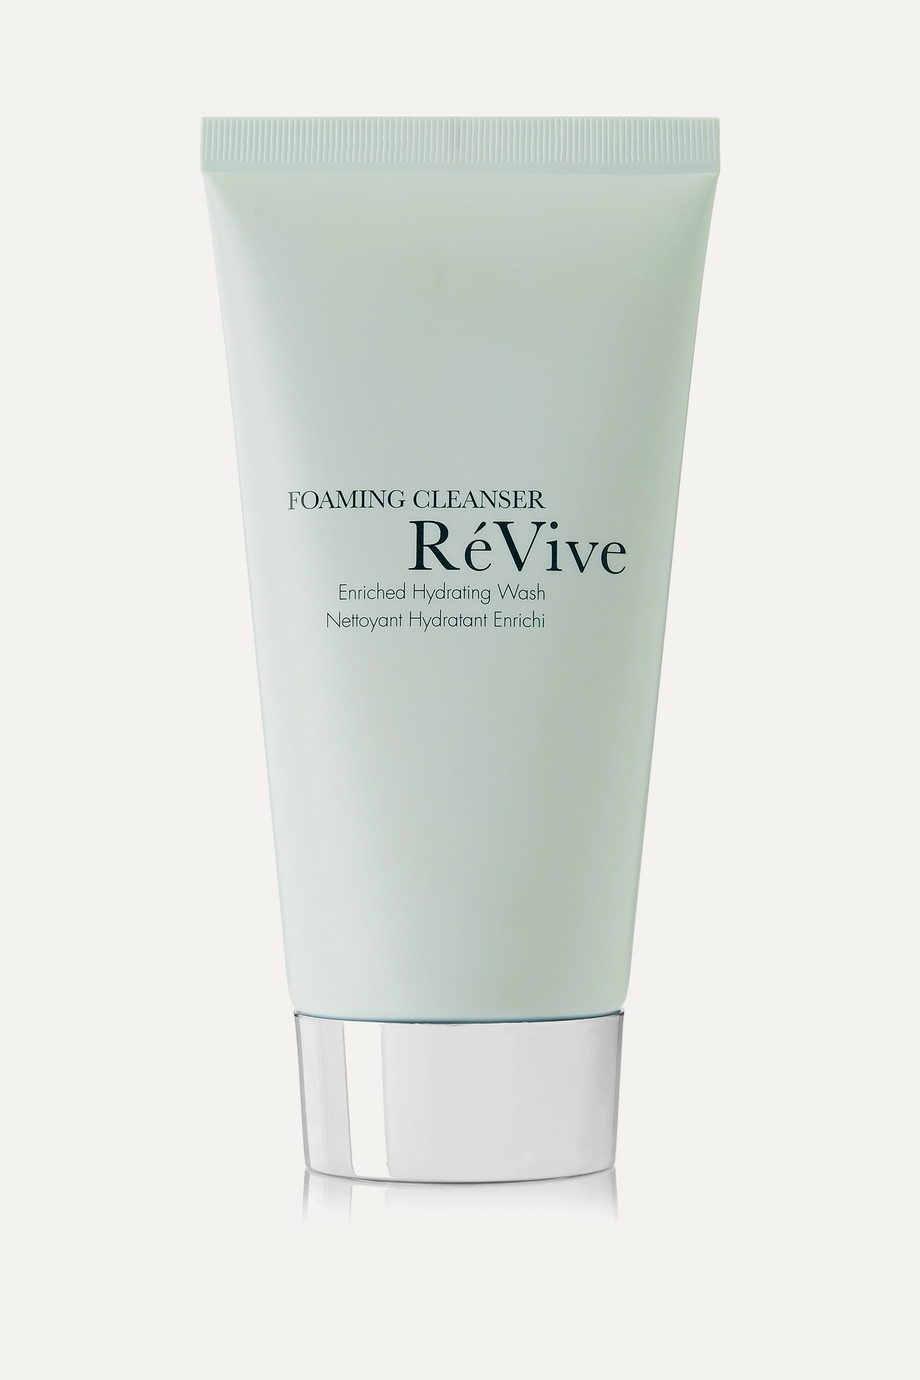 RéVive Foaming Cleanser, 125ml